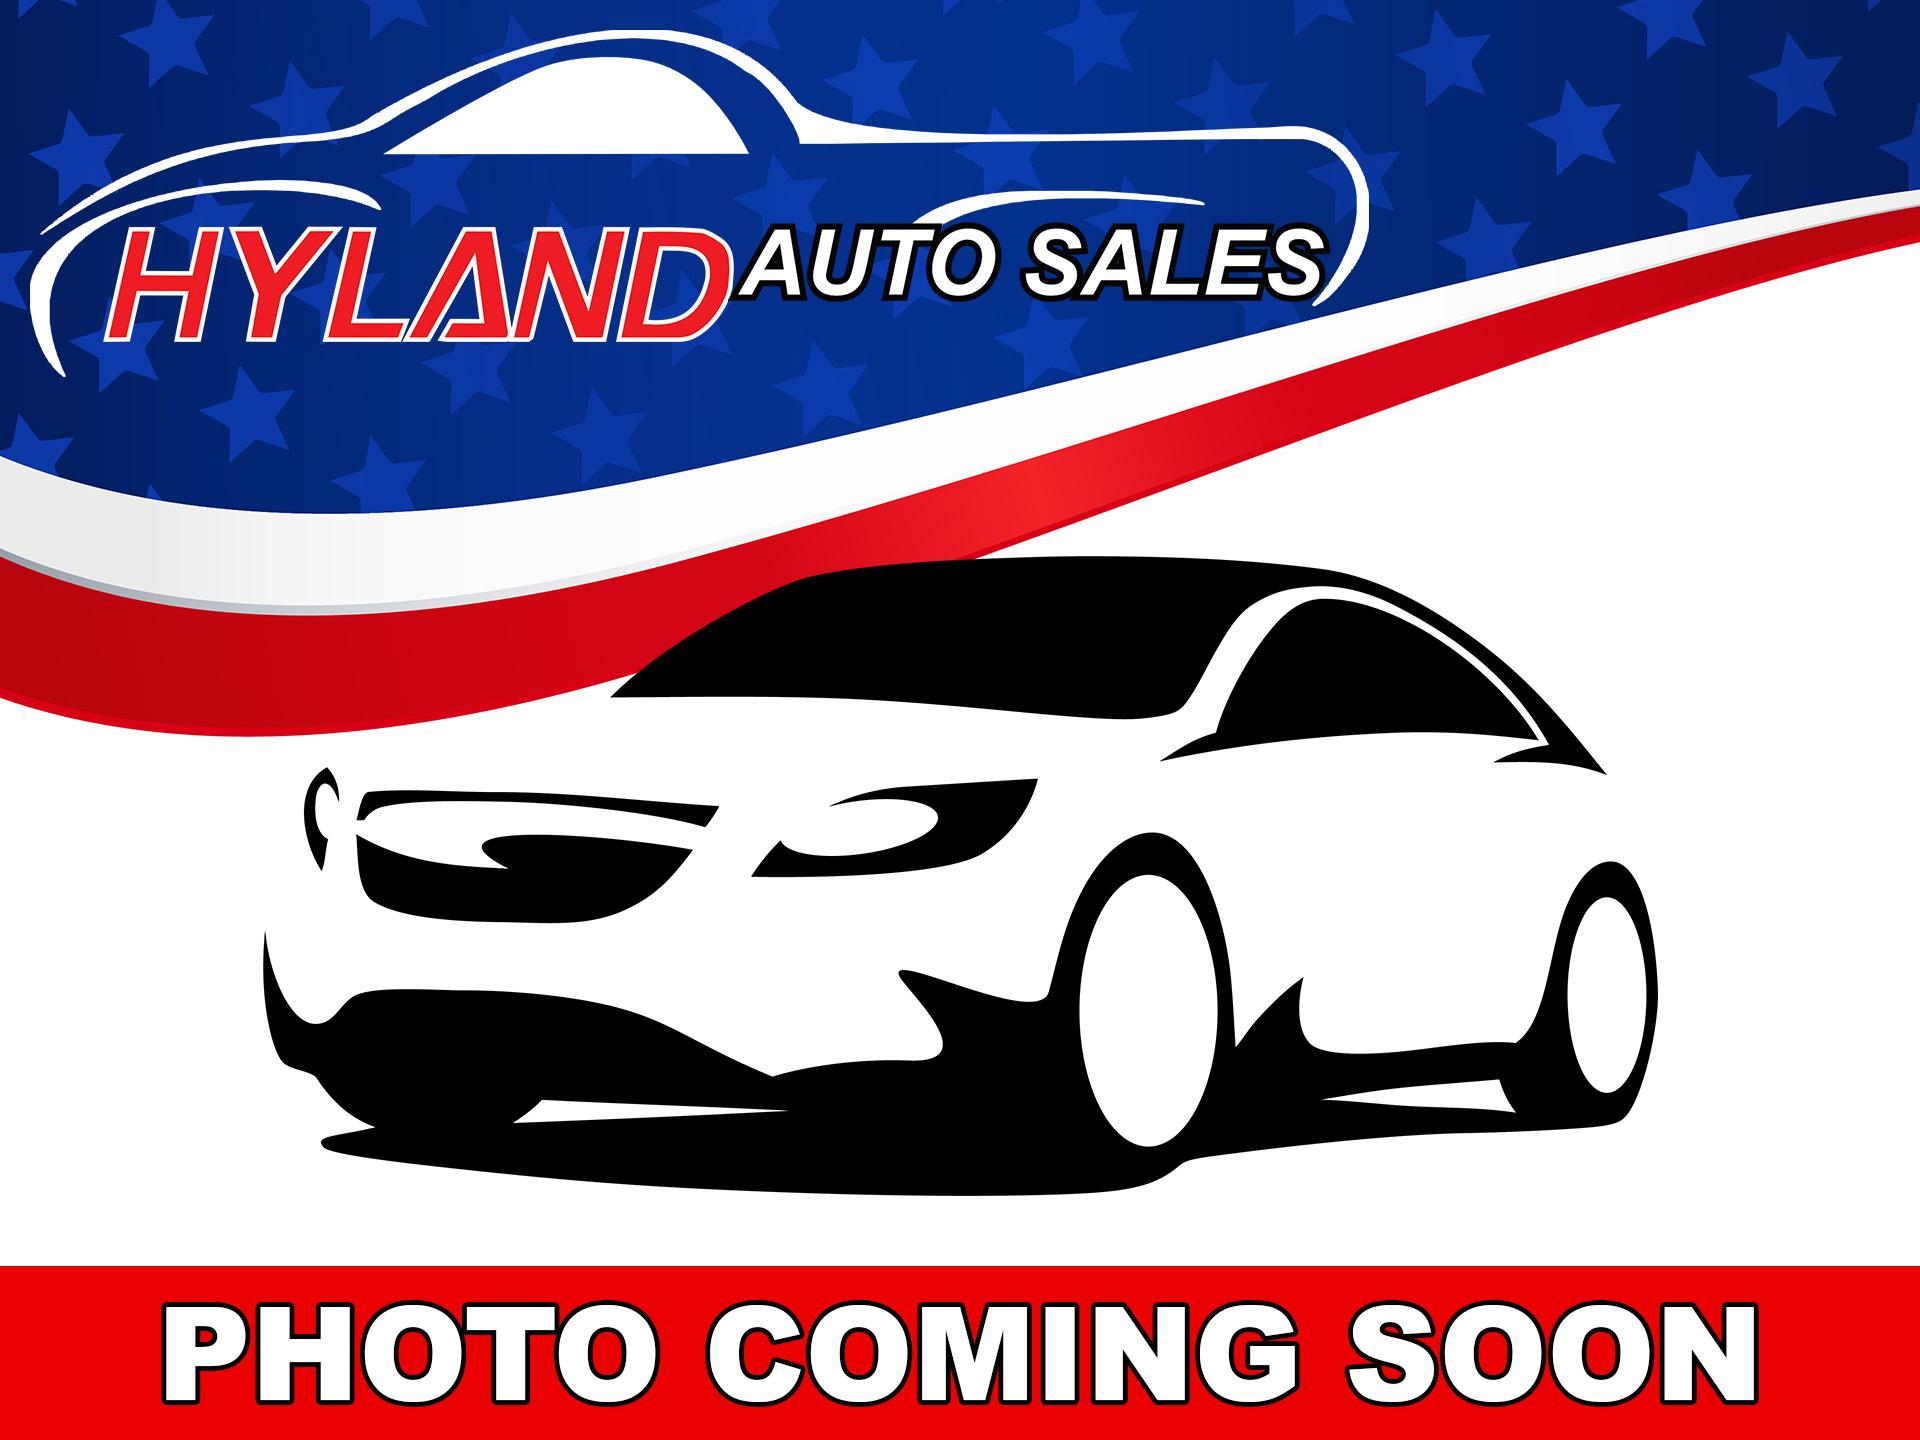 Hyland CL Coming Soon.jpg